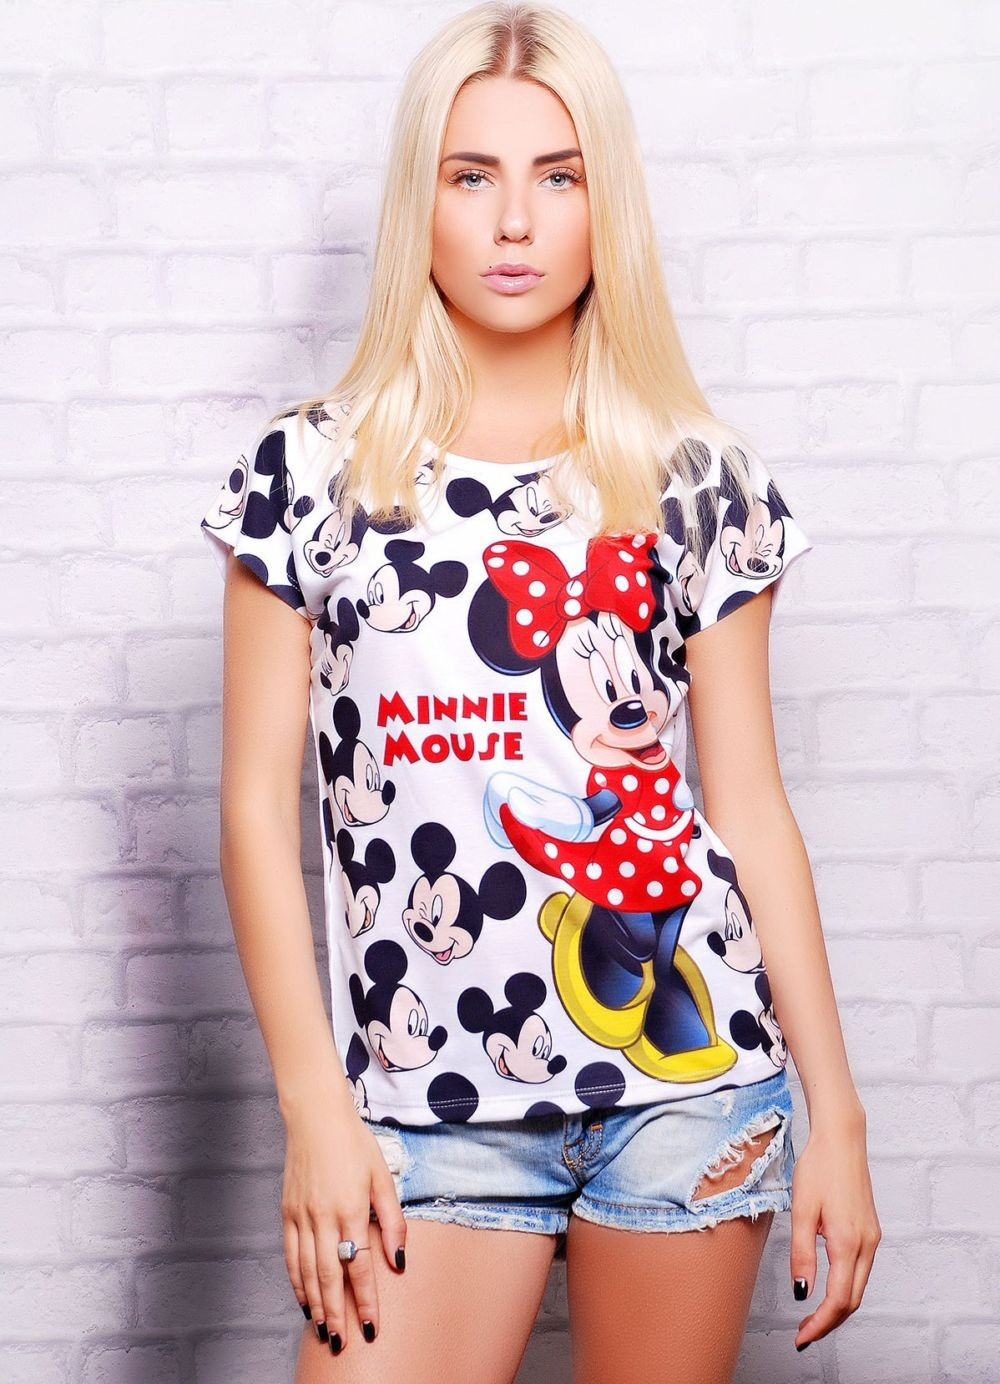 футболки 2019: короткая с принтом Микки Мауса